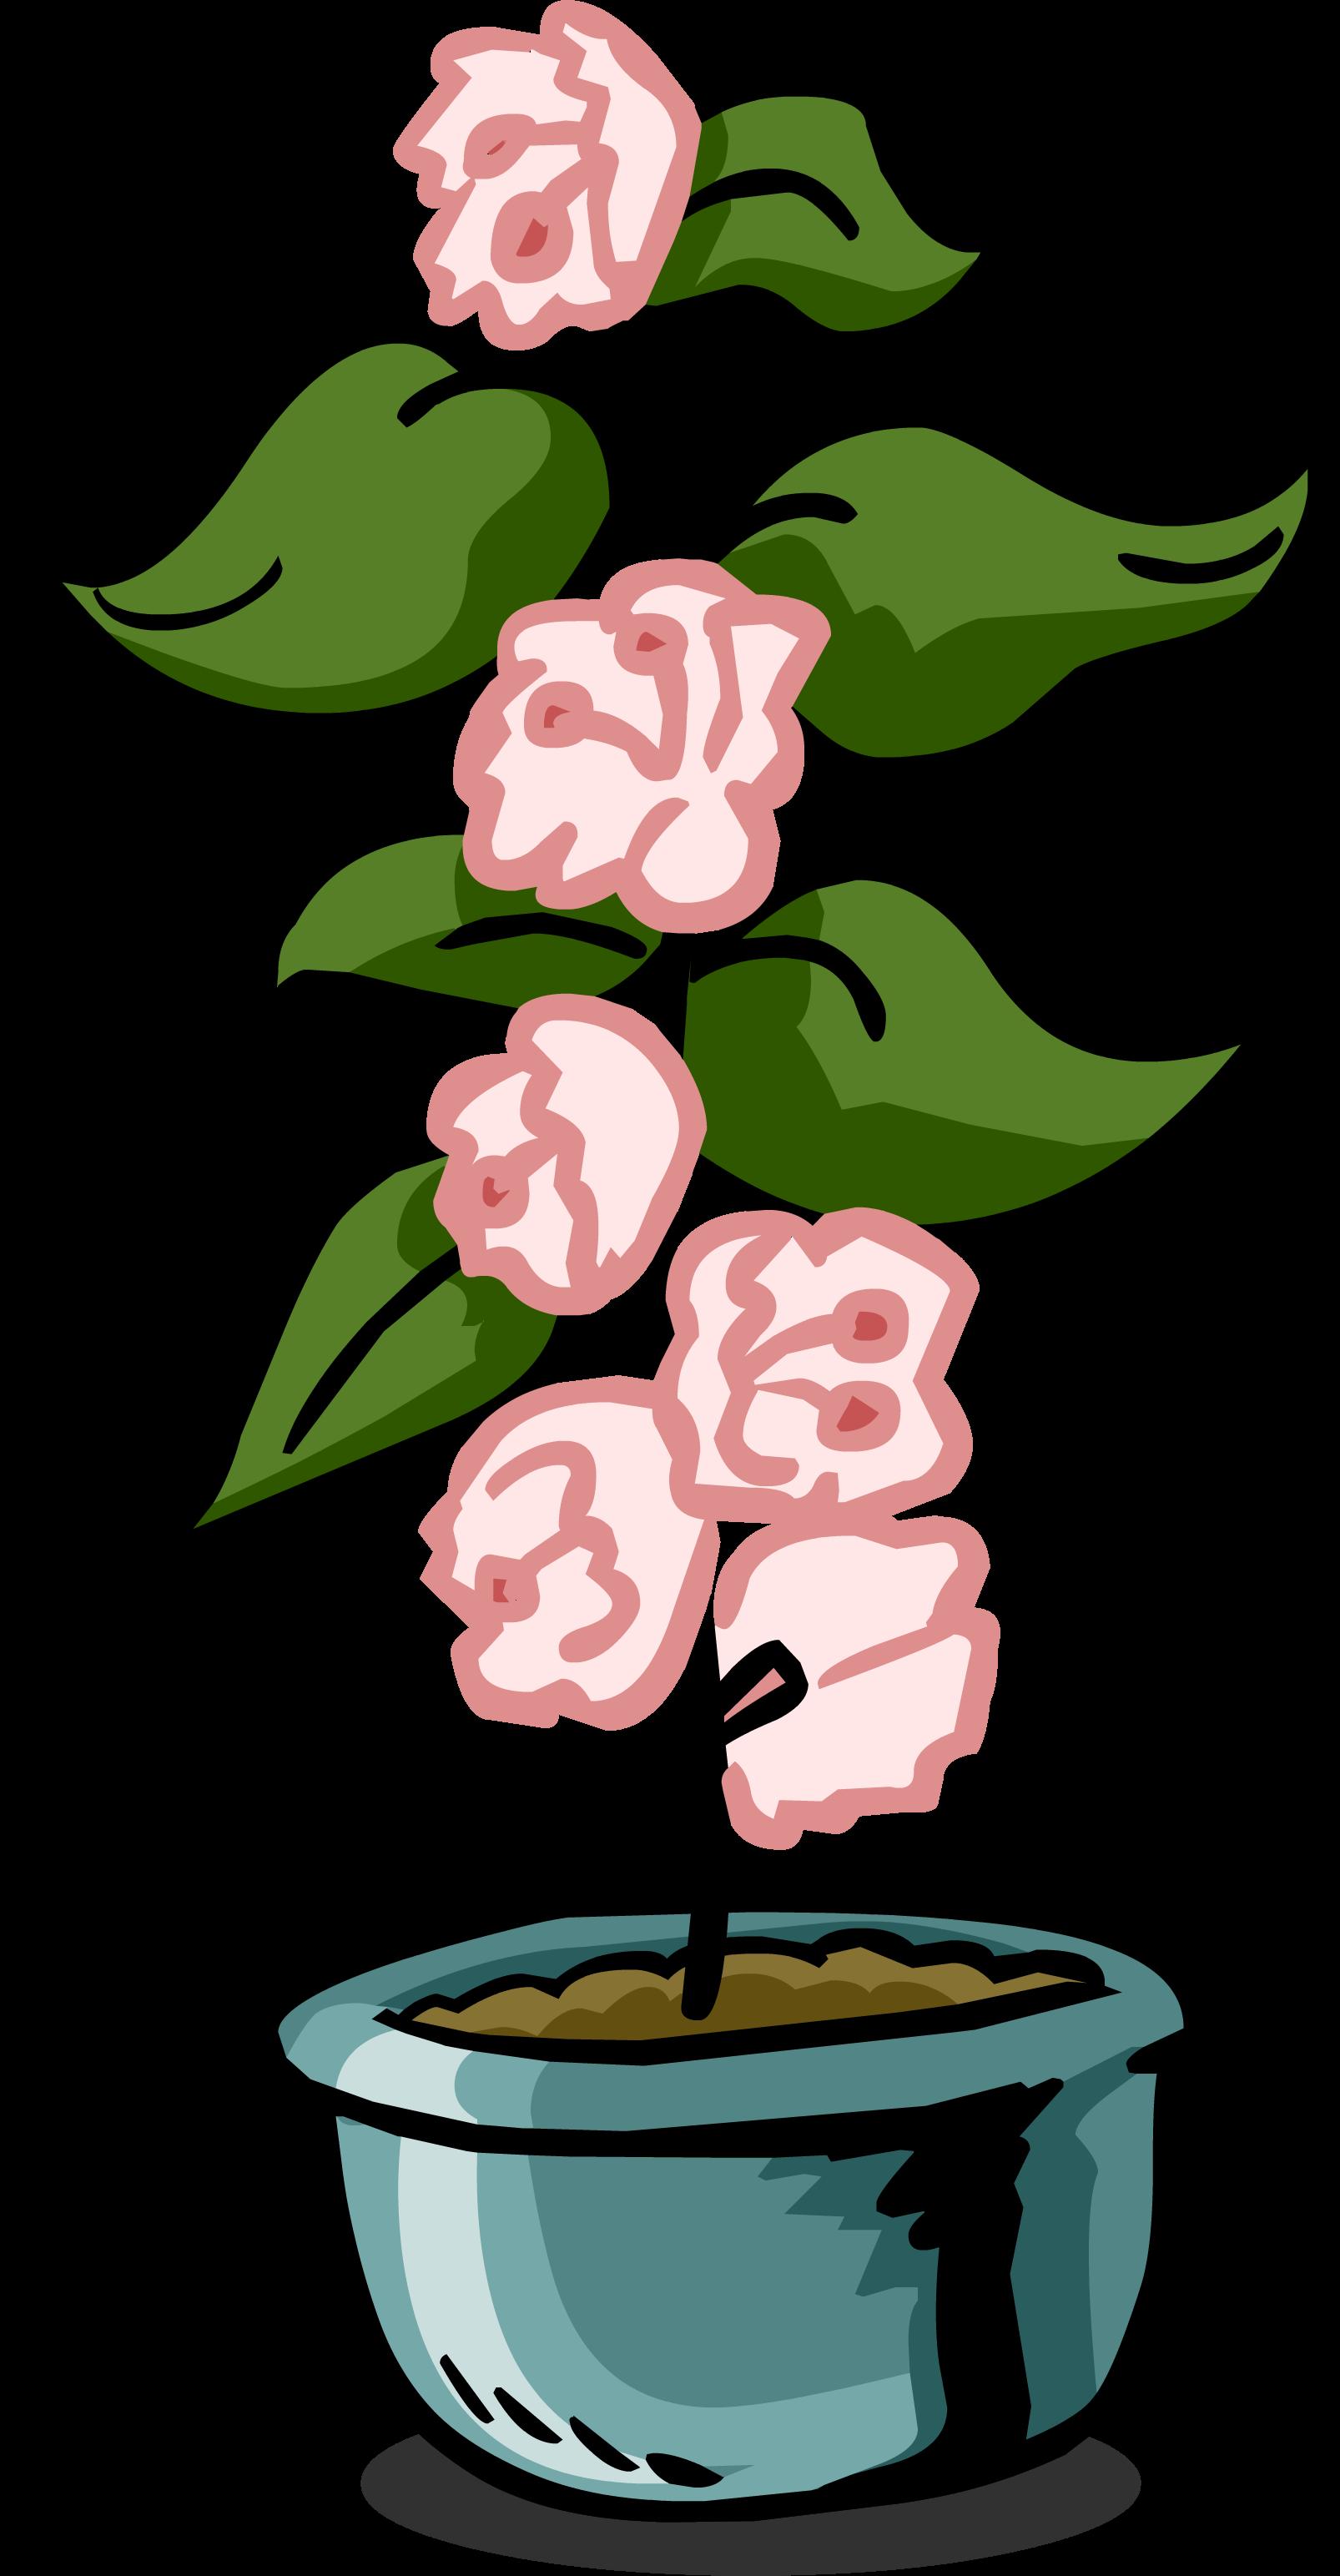 Plants clipart house plant. Growing club penguin wiki